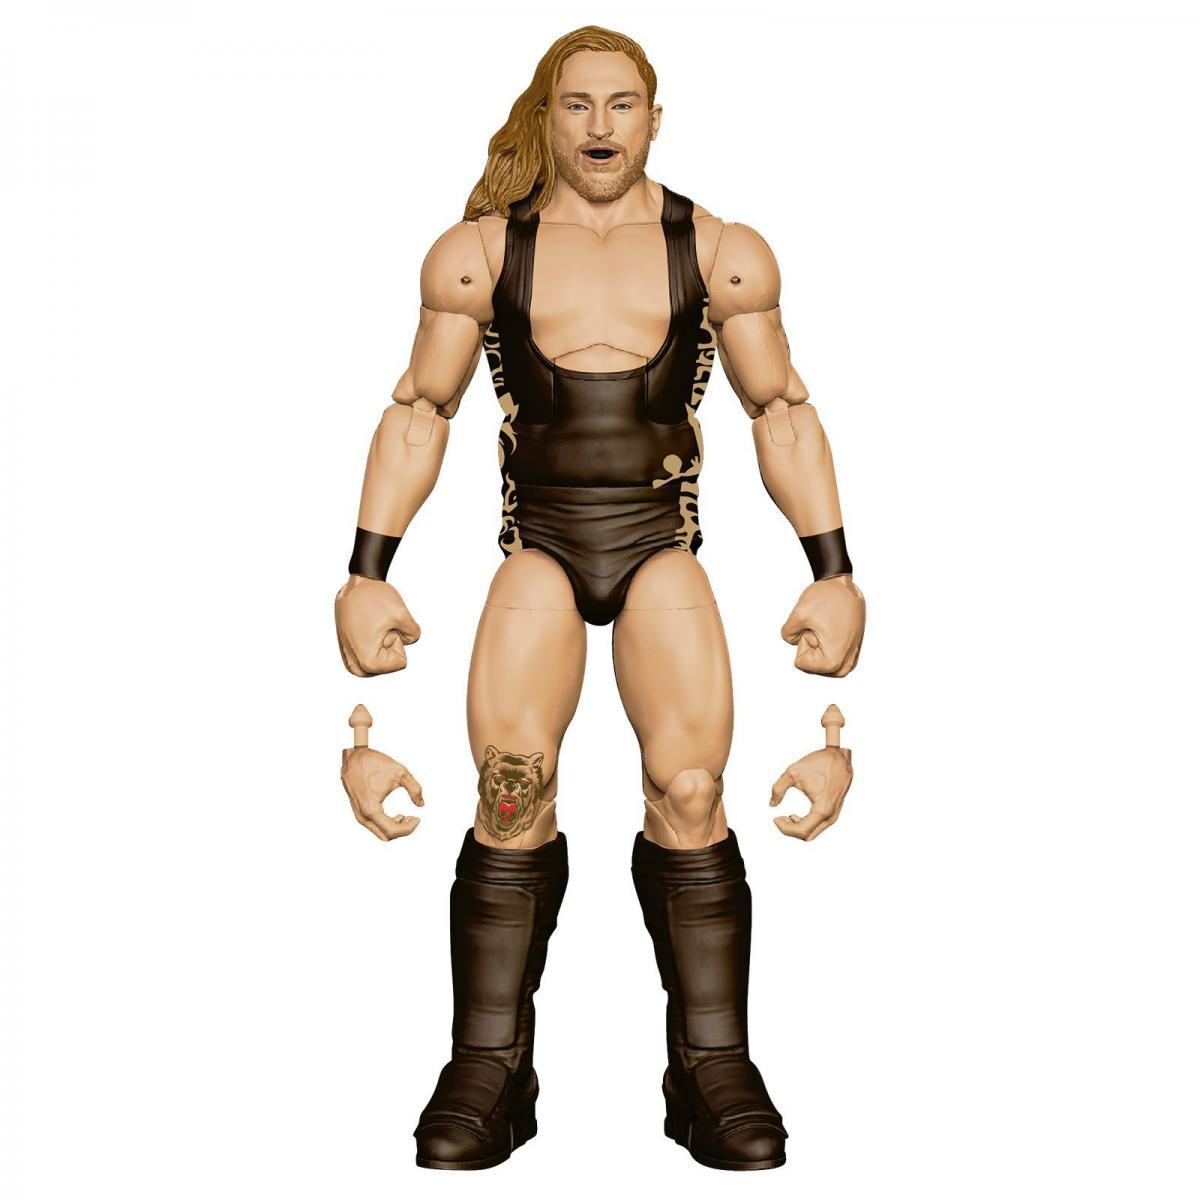 Here is the next @PeteDunneYxB WWE Elite Figure #SDCC